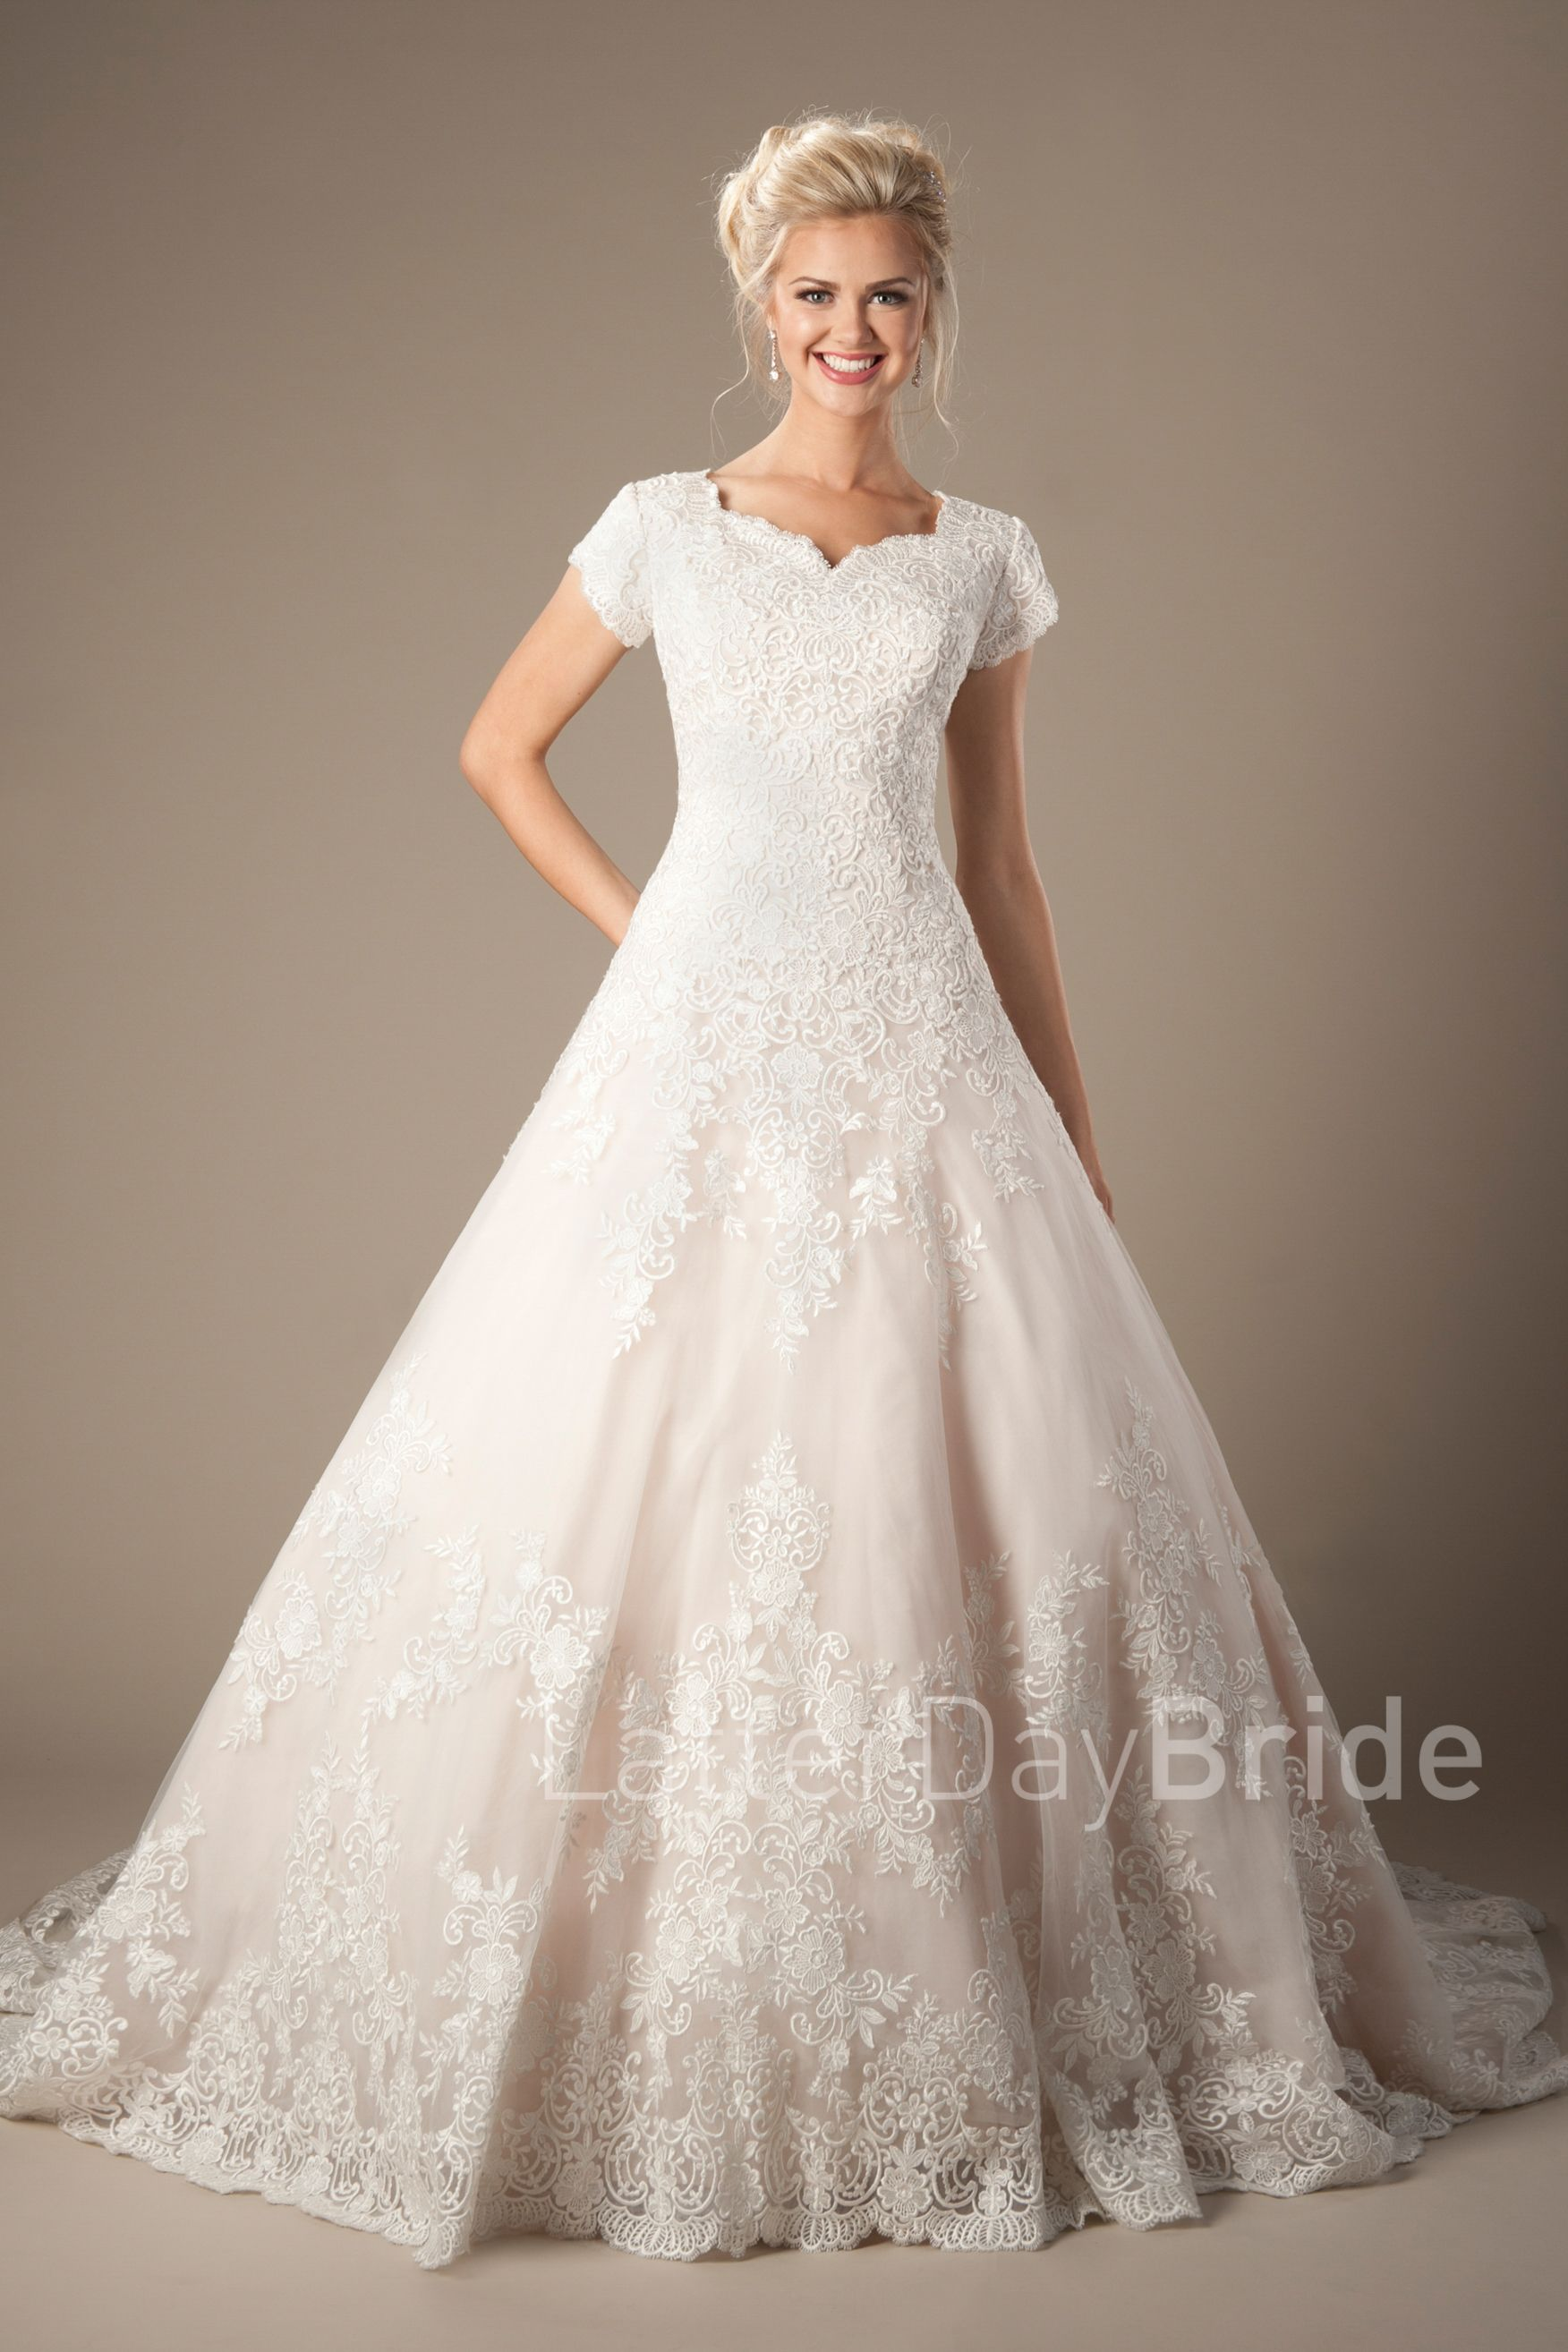 Dennison Modest Wedding Dress Latterdaybride Worldwide